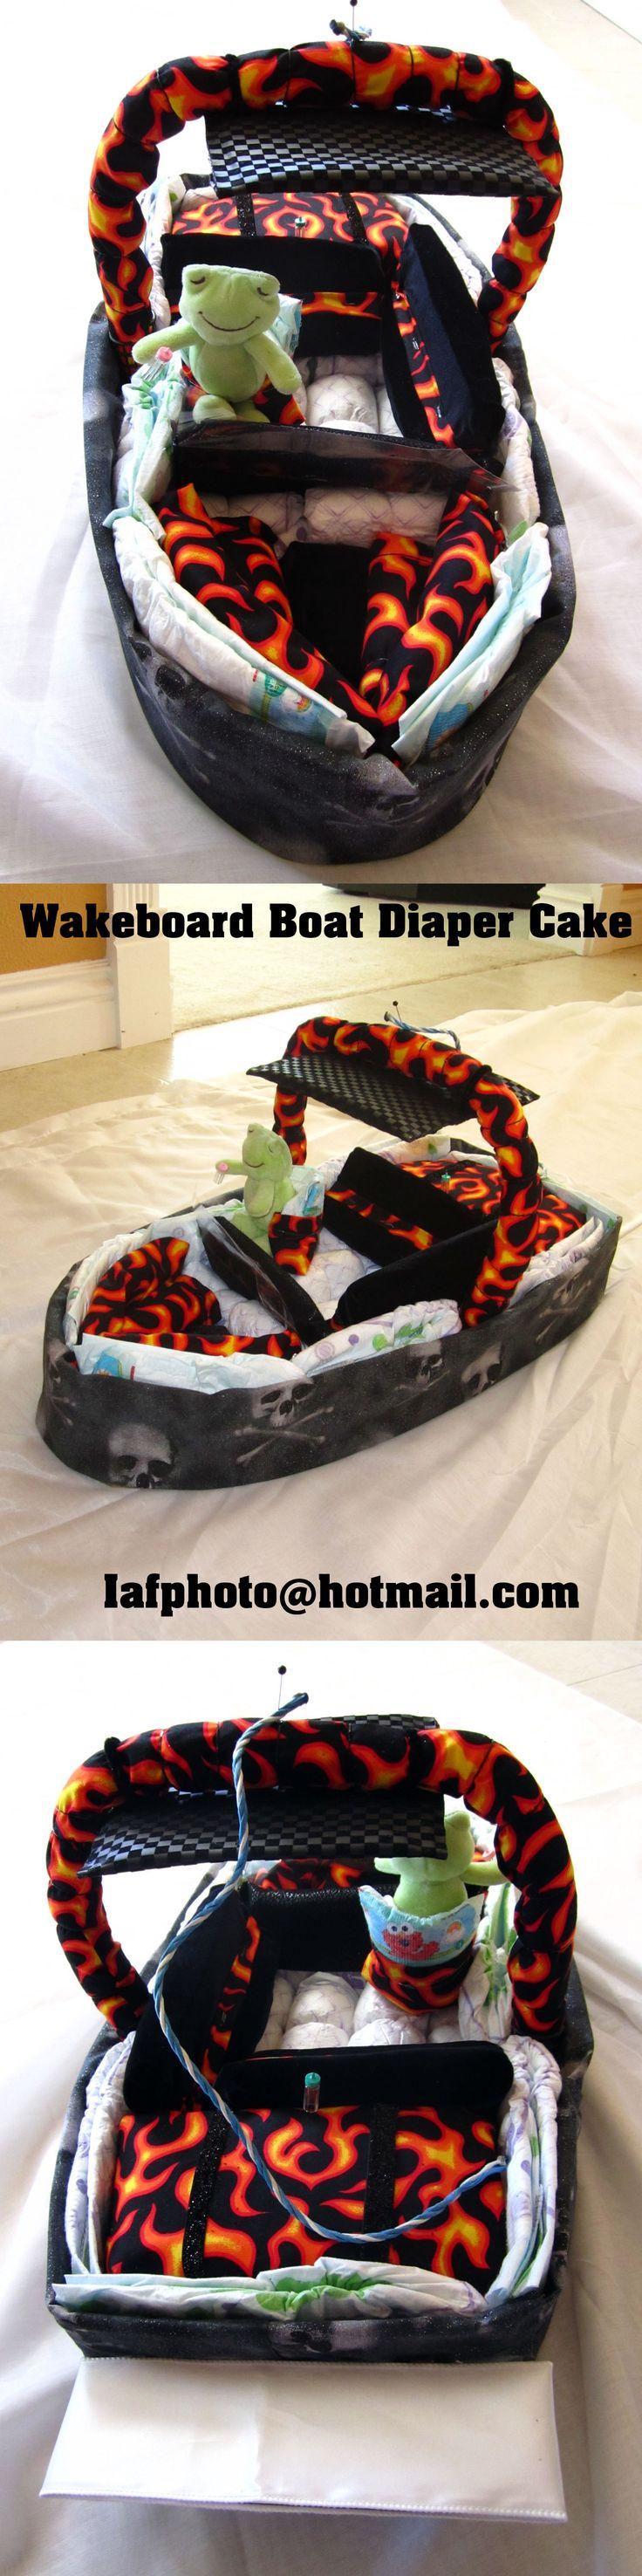 Wakeboard Boat Diaper Cake